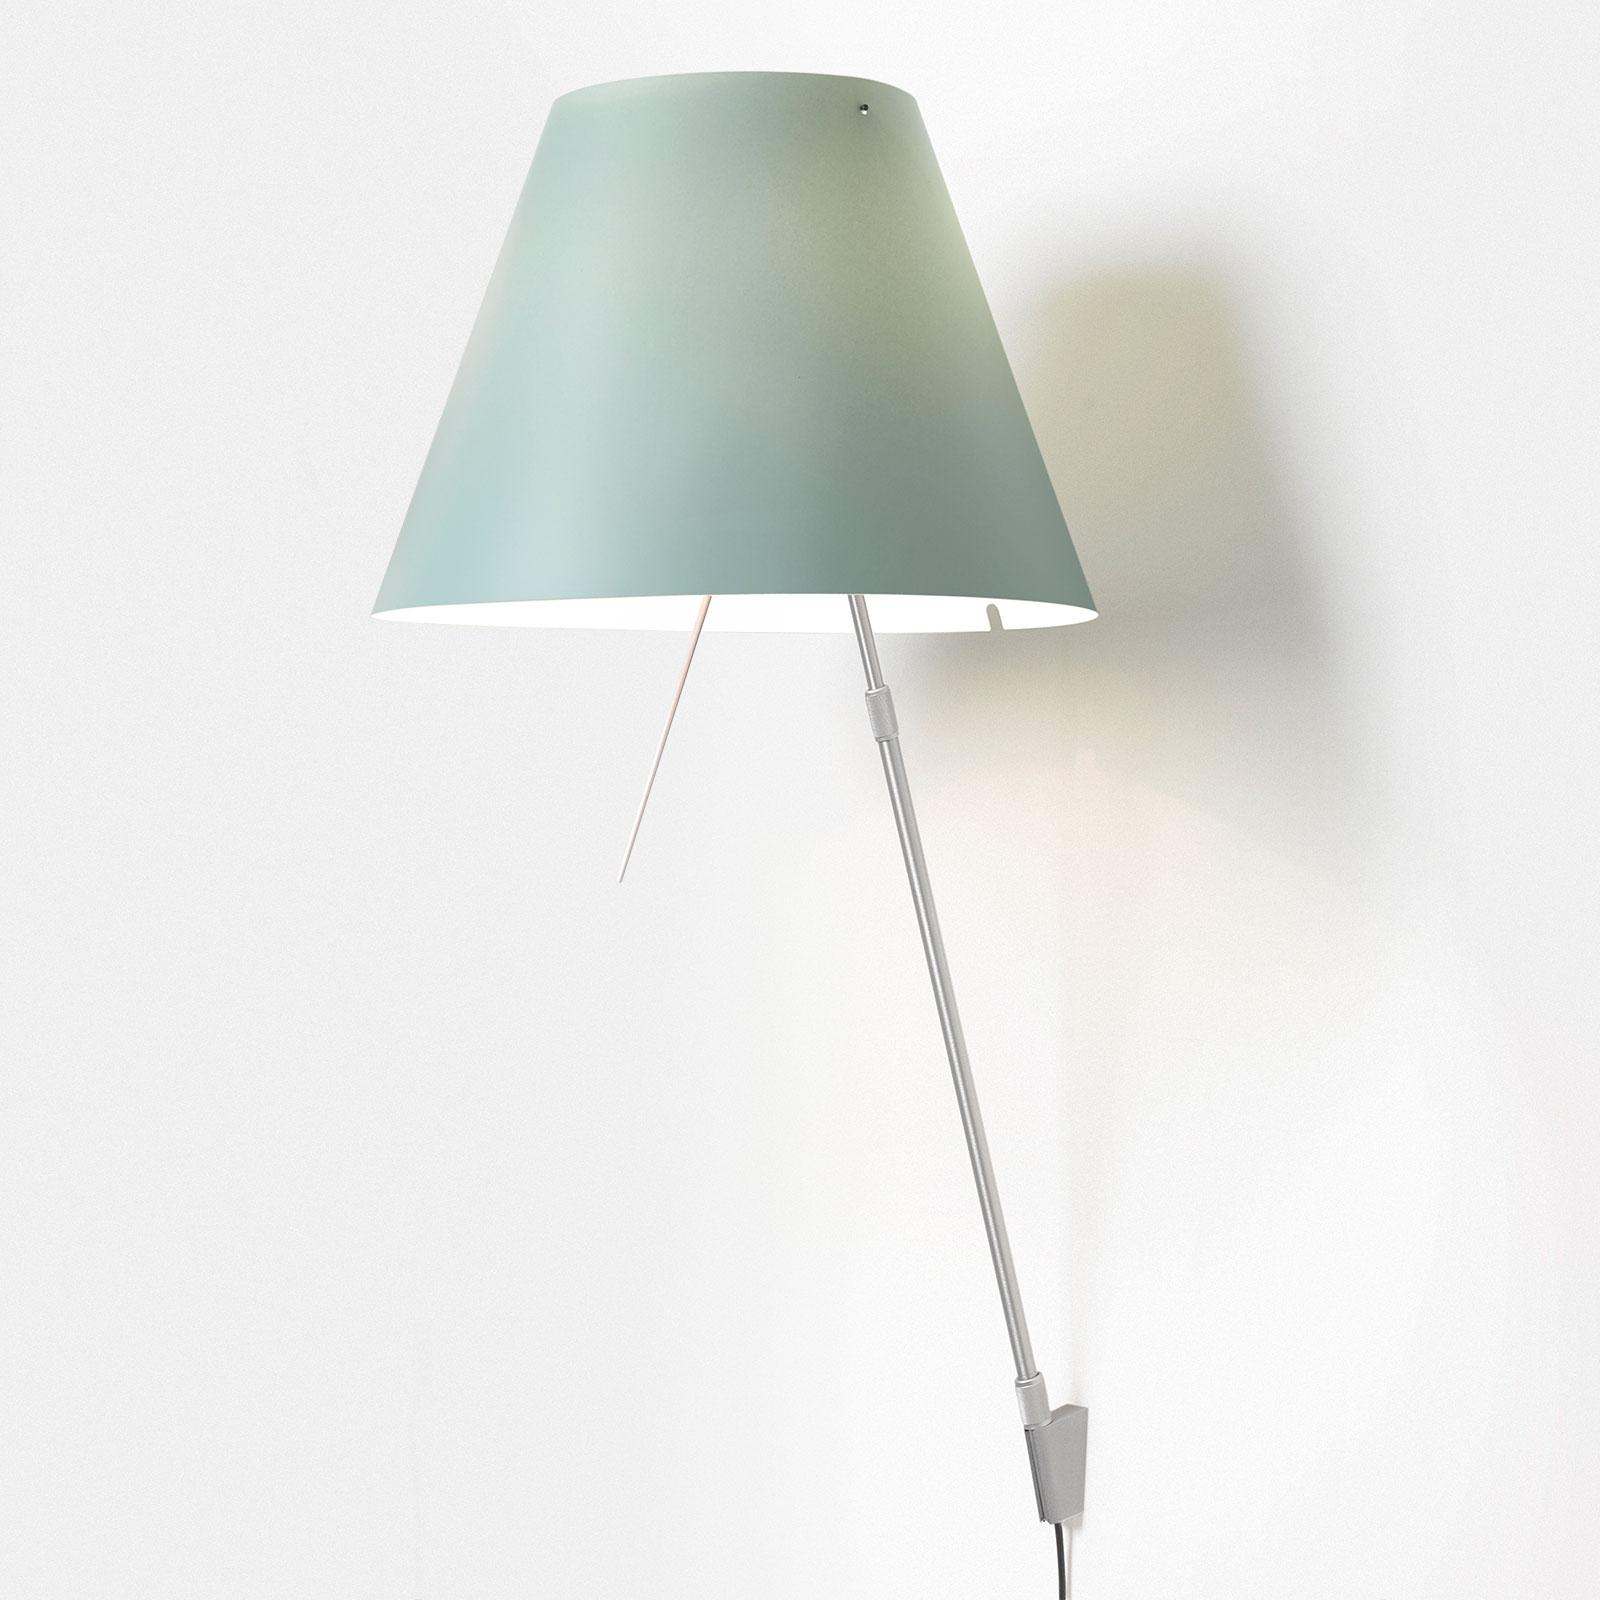 Luceplan Costanza D13a, alumiini/vihreä